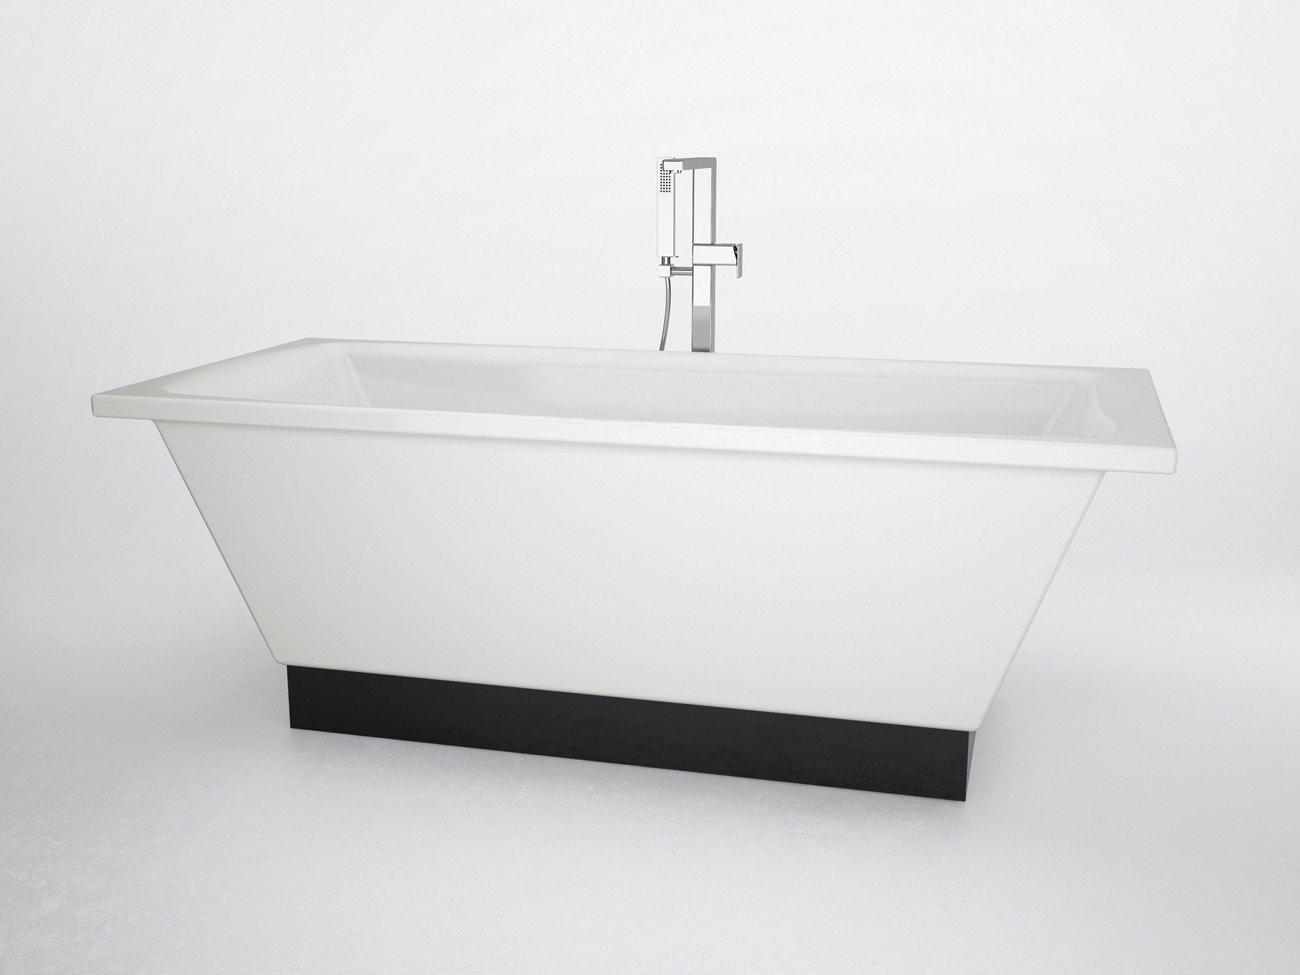 Vasca in christal tech bianca con base nera flat - Vasca da bagno nera ...